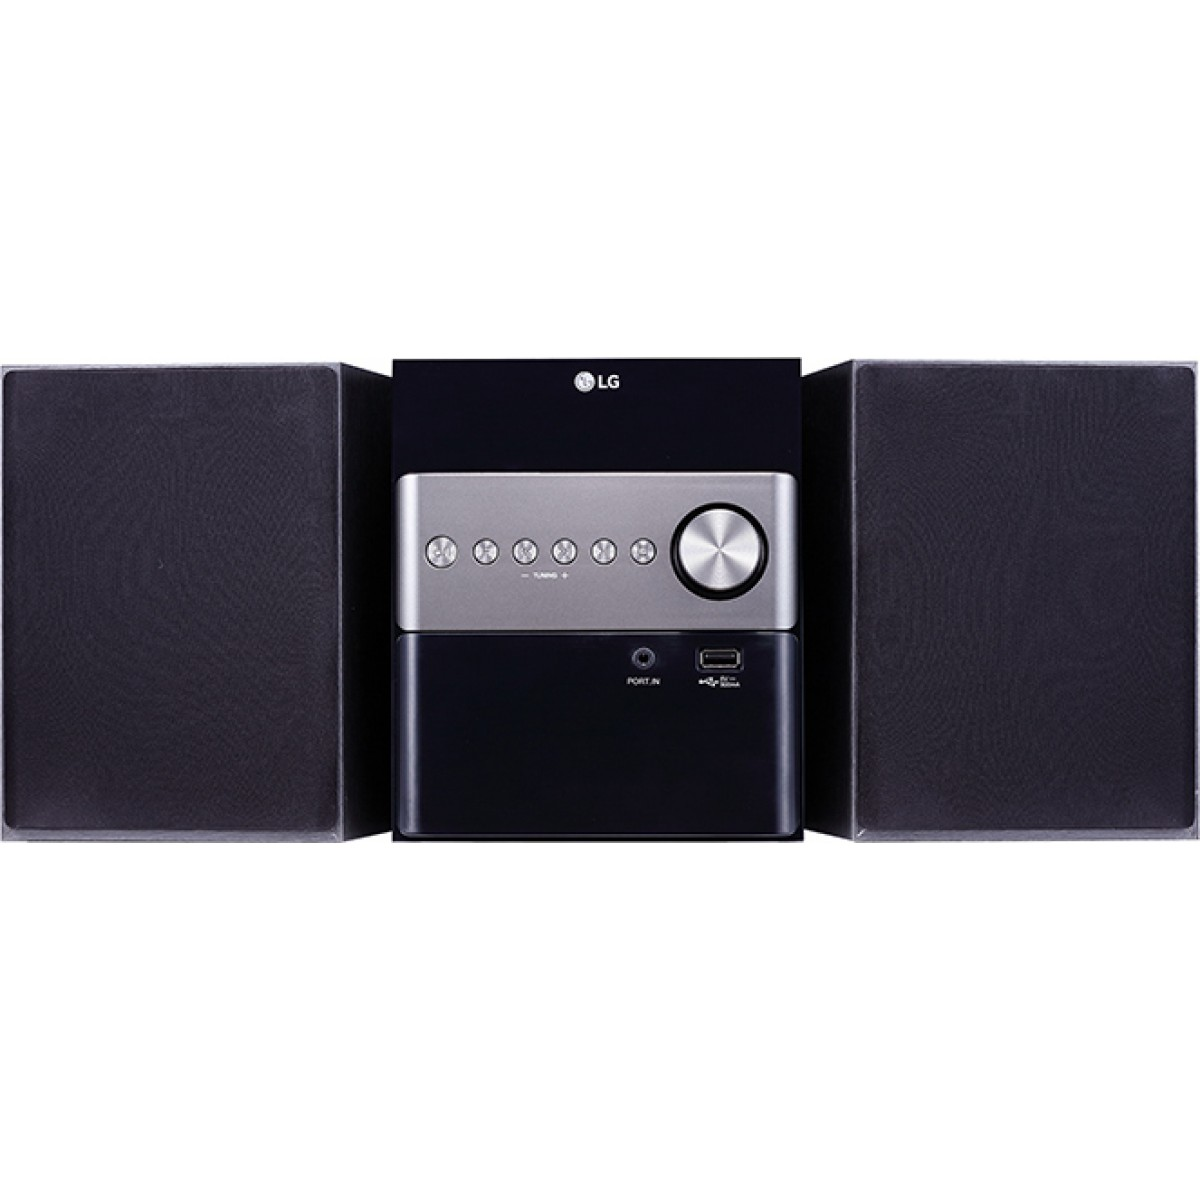 CM1560.AWEULLK Hi - Fi Ηλεκτρικες Συσκευες - homeelectrics.gr